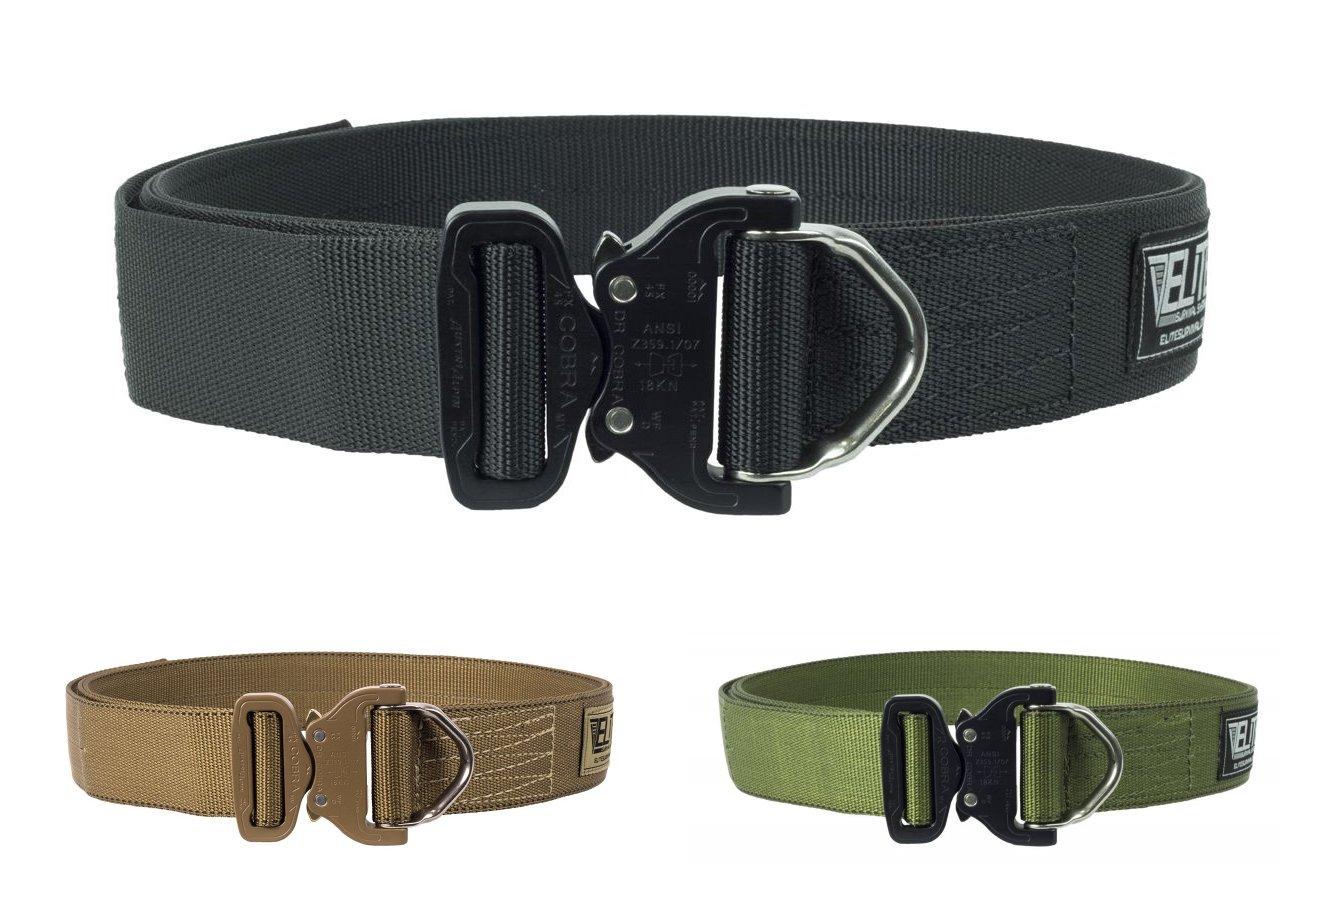 Elite Survival Systems ELSCRB-M-XL Cobra Rigger/'s with D Ring Buckle Belt,